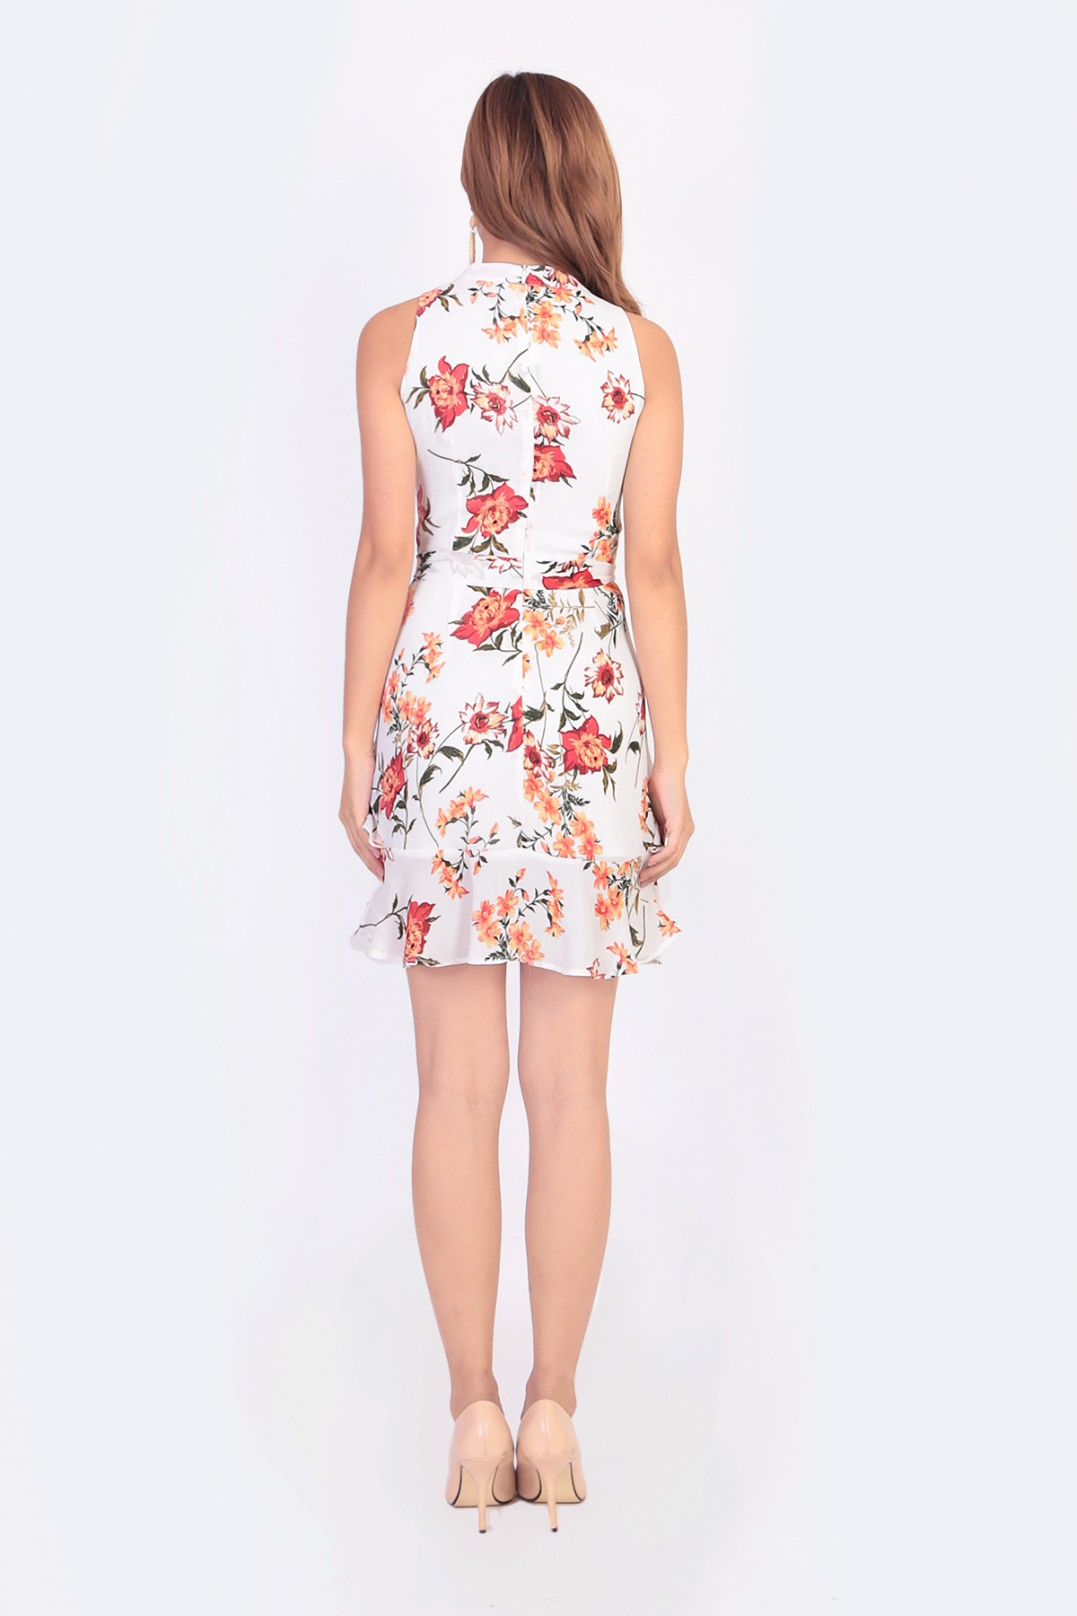 5fbc7eeed9cf Laura Floral Dress in White - MGP